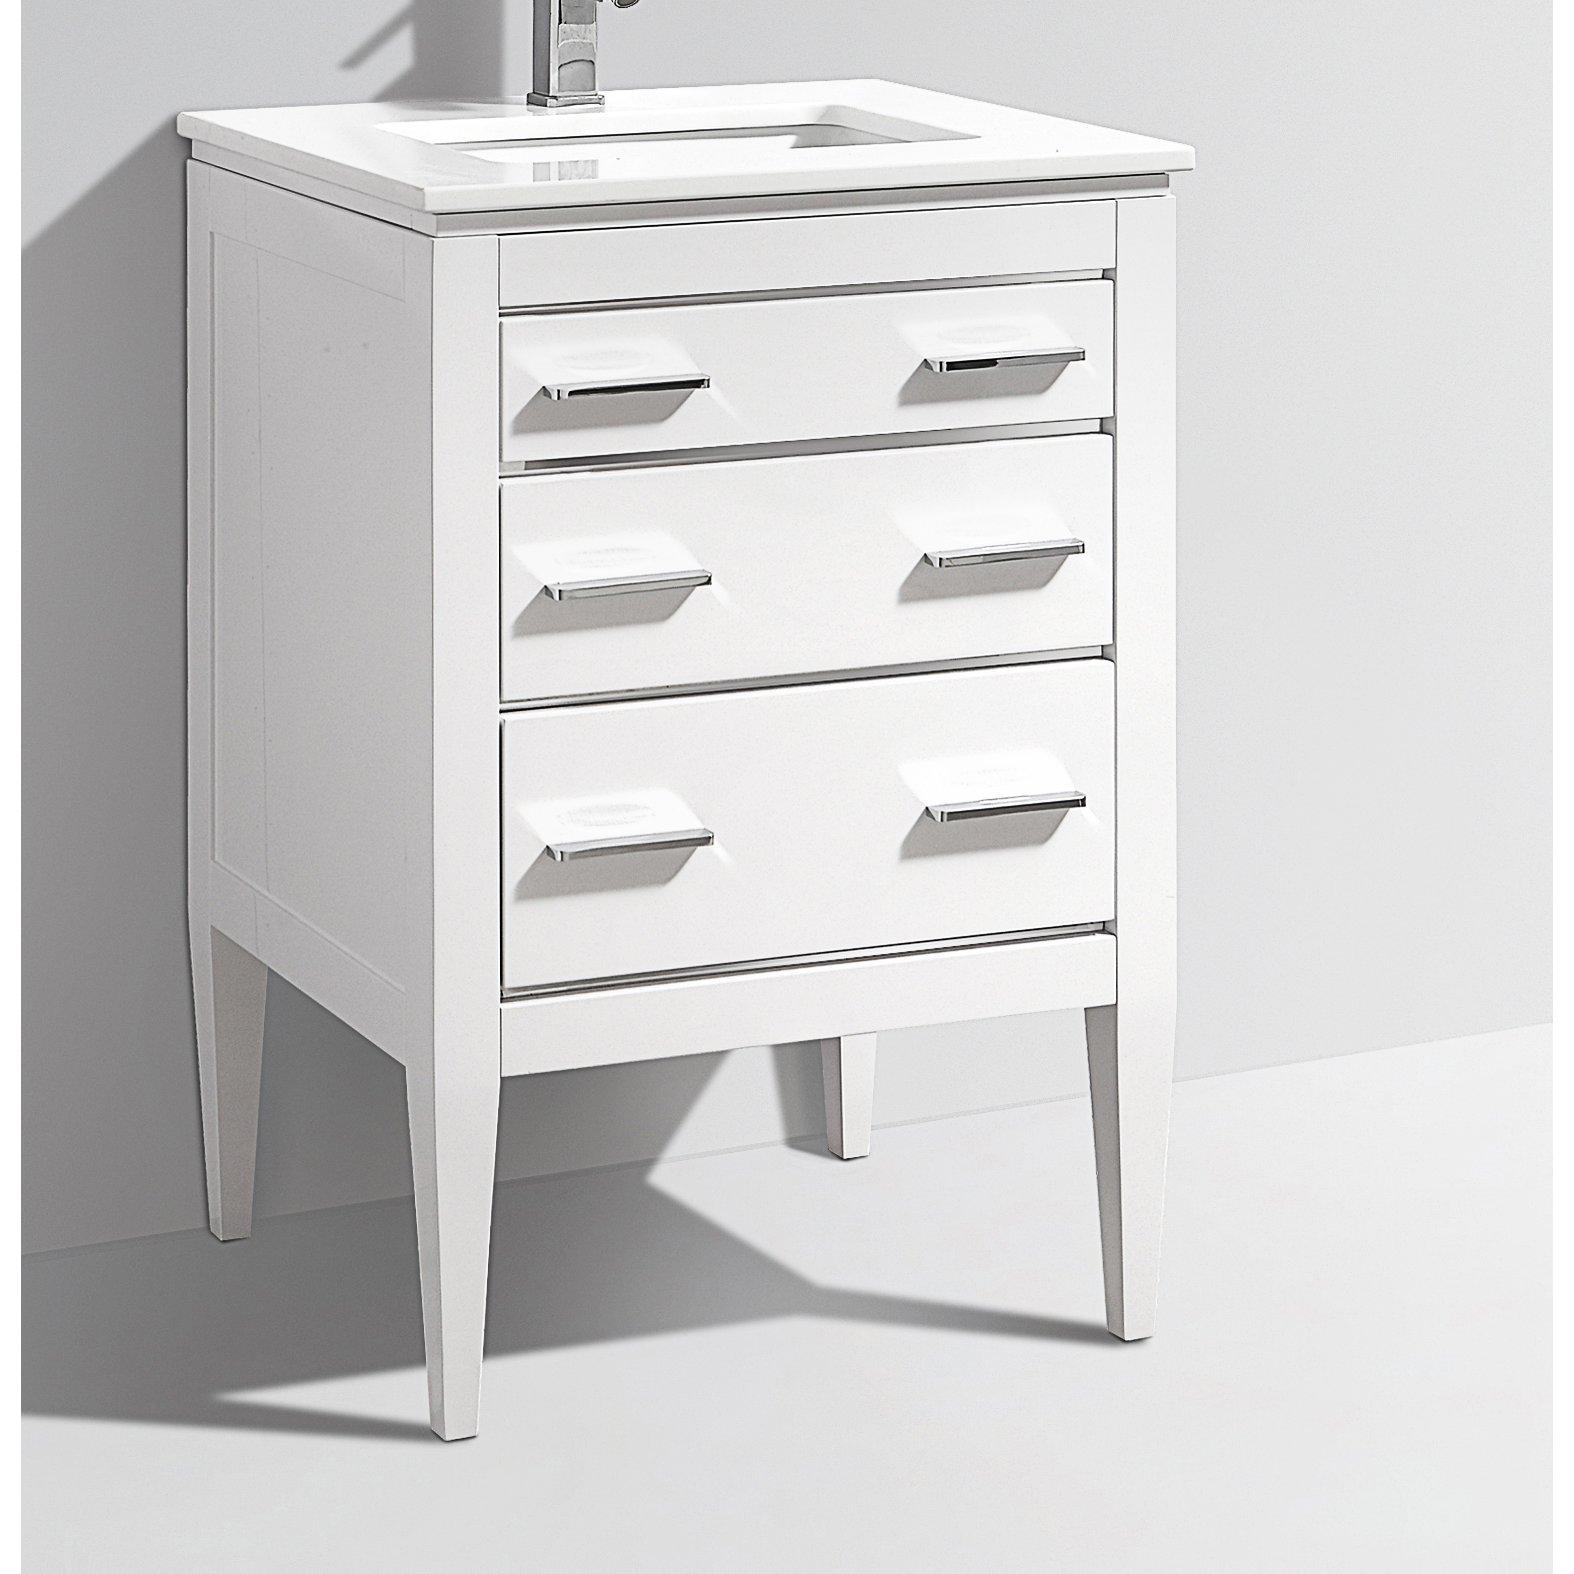 24 inch contemporary bathroom vanity white glossy finish for White contemporary bathroom vanity